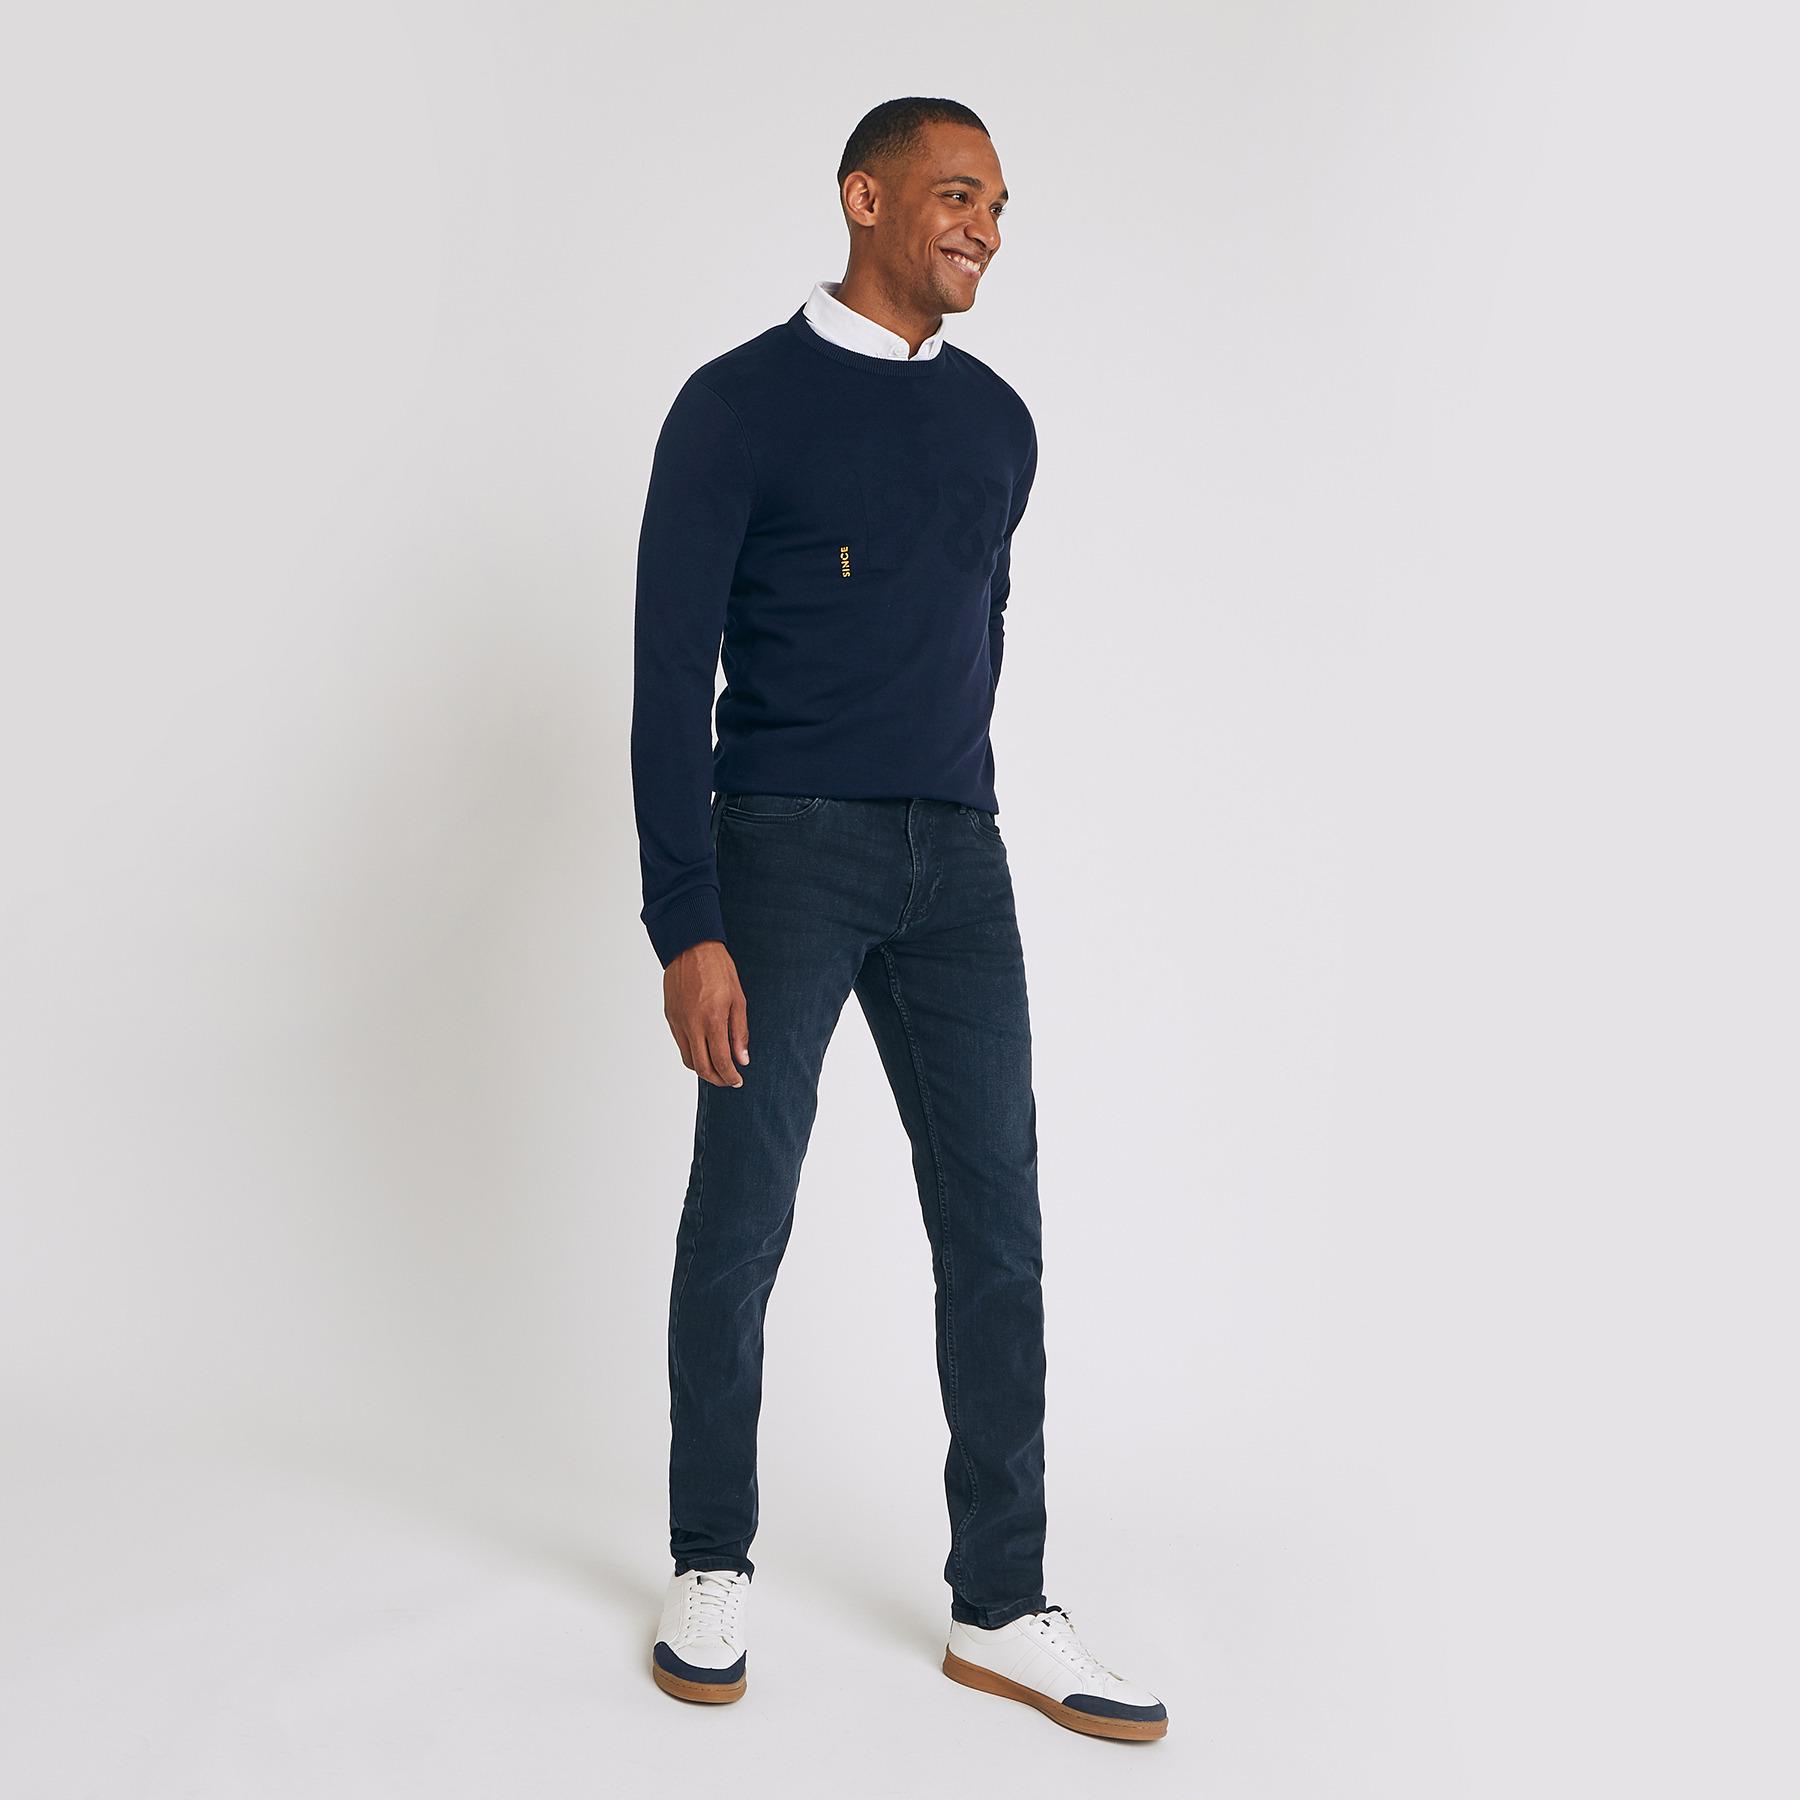 Jean slim #Tom urbanflex 4 longueurs blue black Bleu Homme